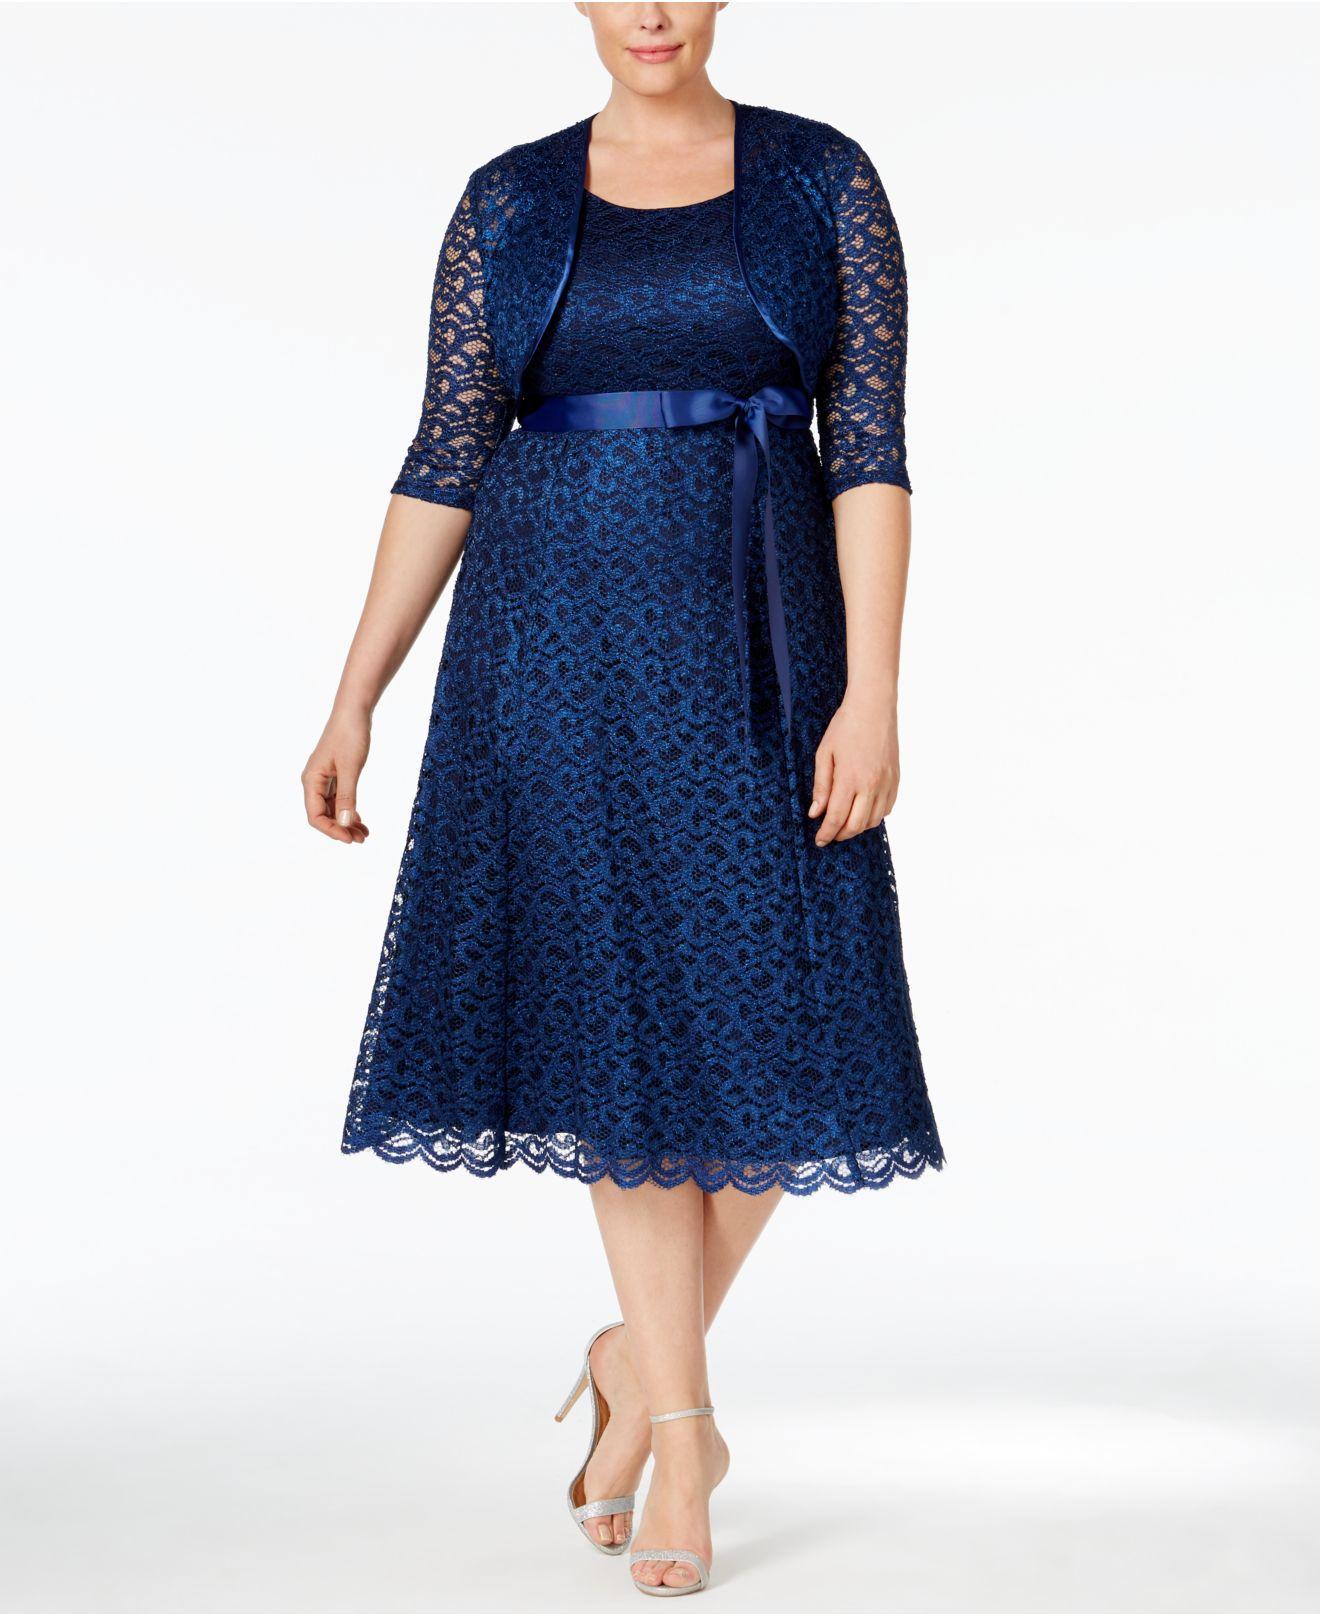 Macys Navy Blue Dresses: R & M Richards Plus Size Sequined Lace Dress And